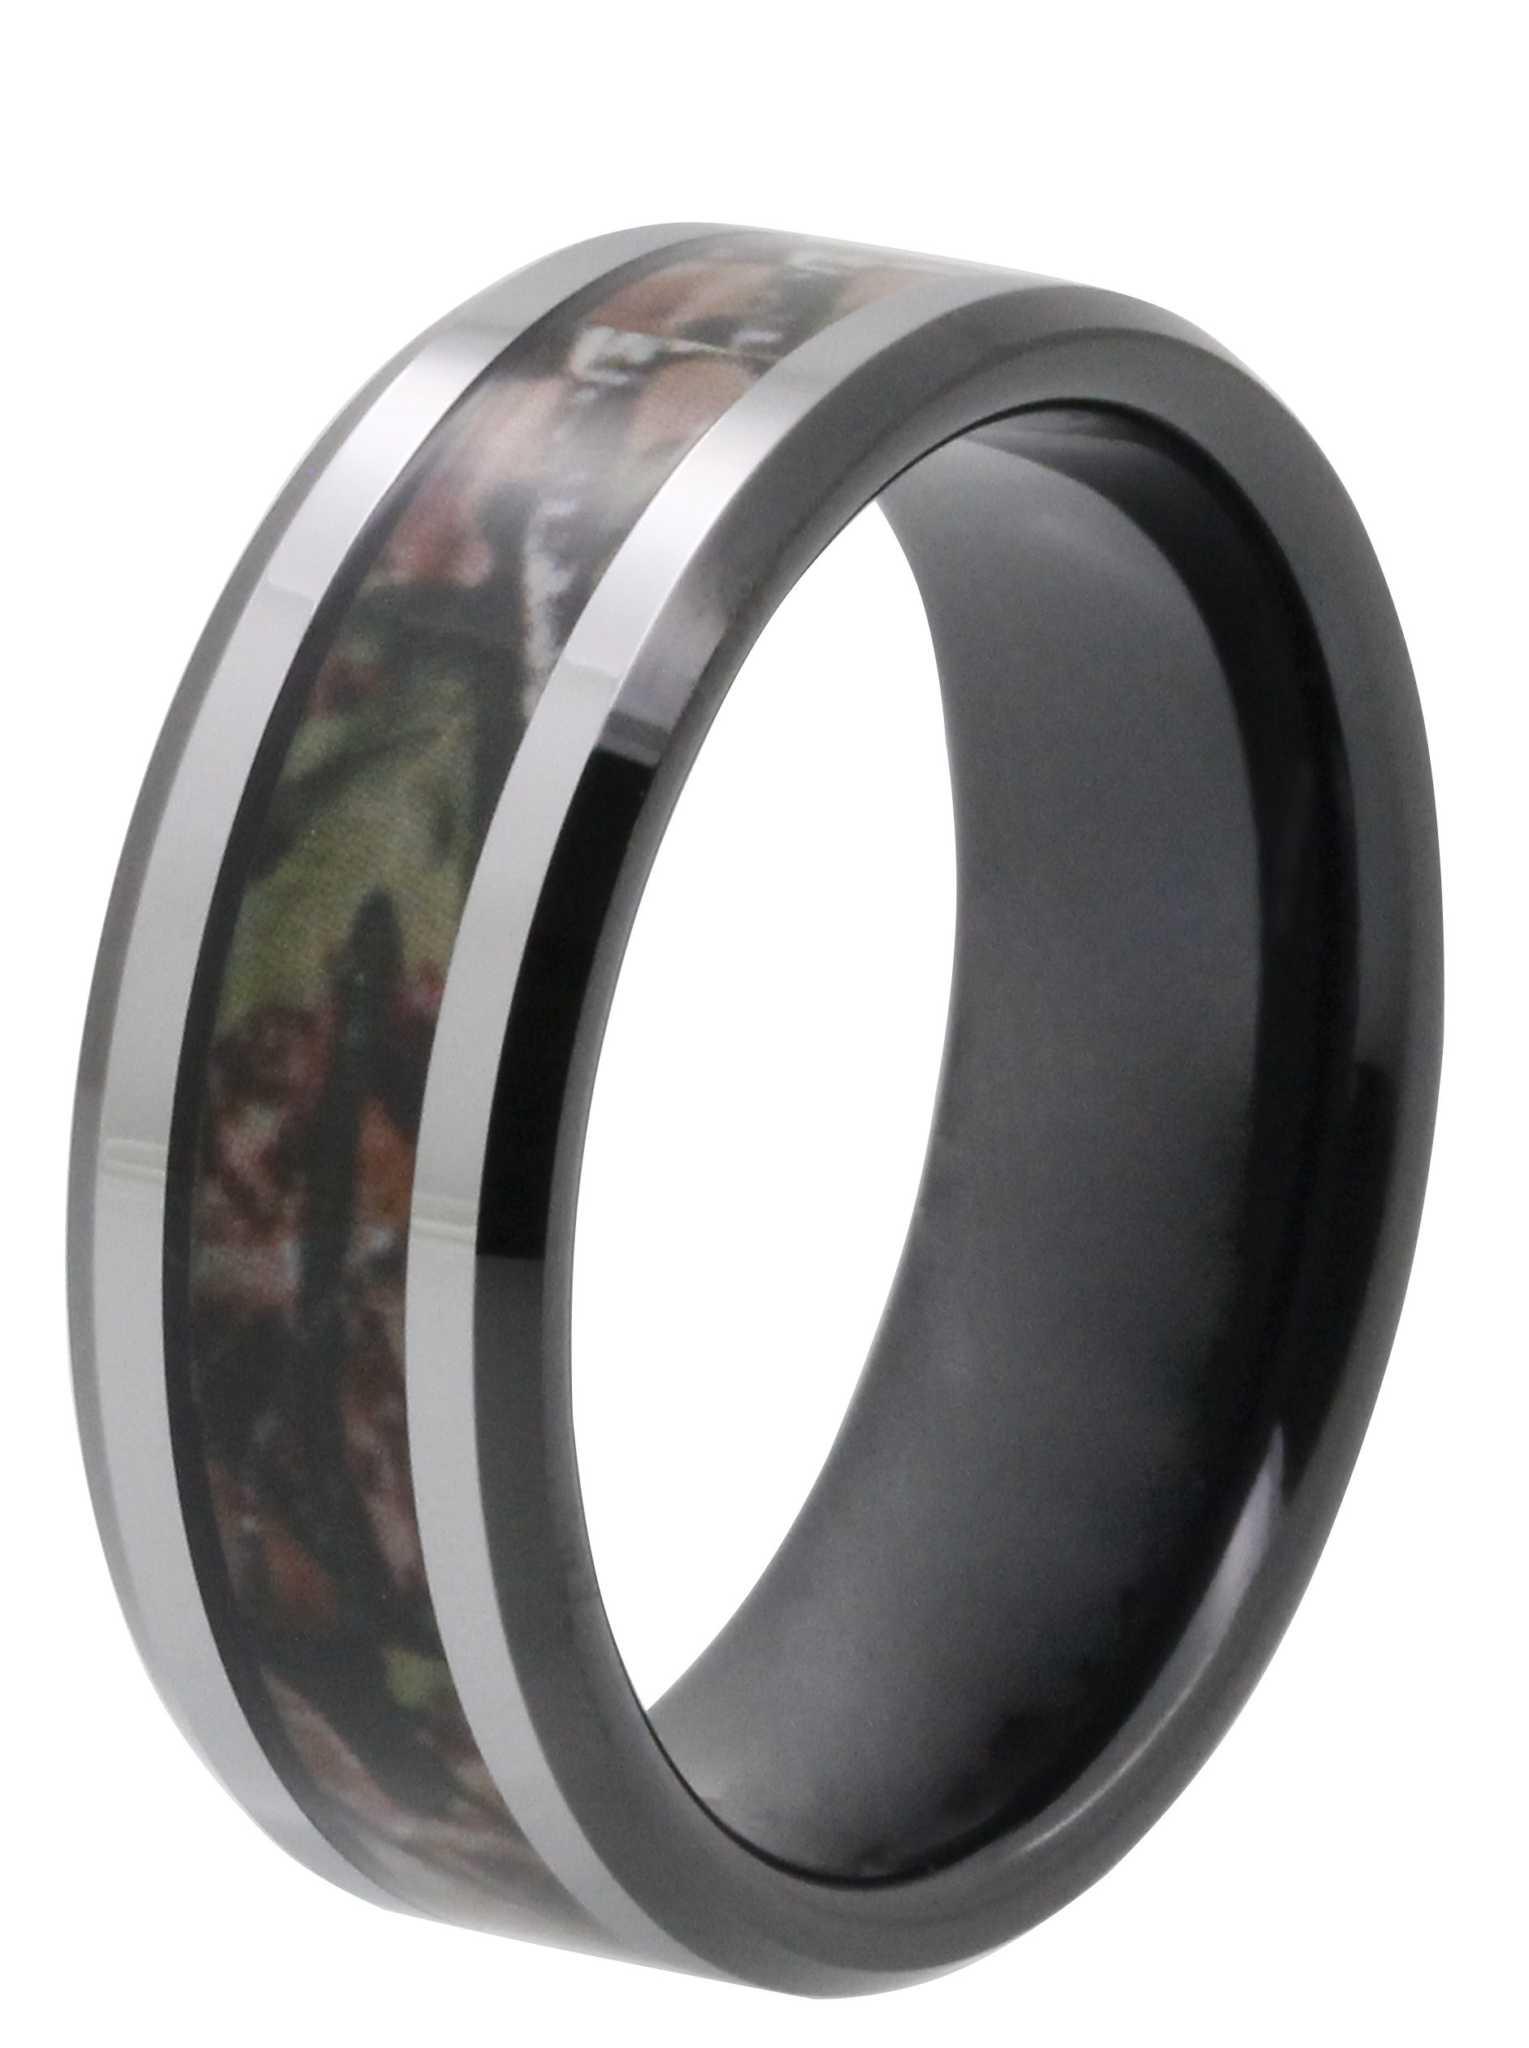 black tungsten rings matching black wedding bands 8MM Dark Camo Inlay TaylorightTungsten Wedding Band